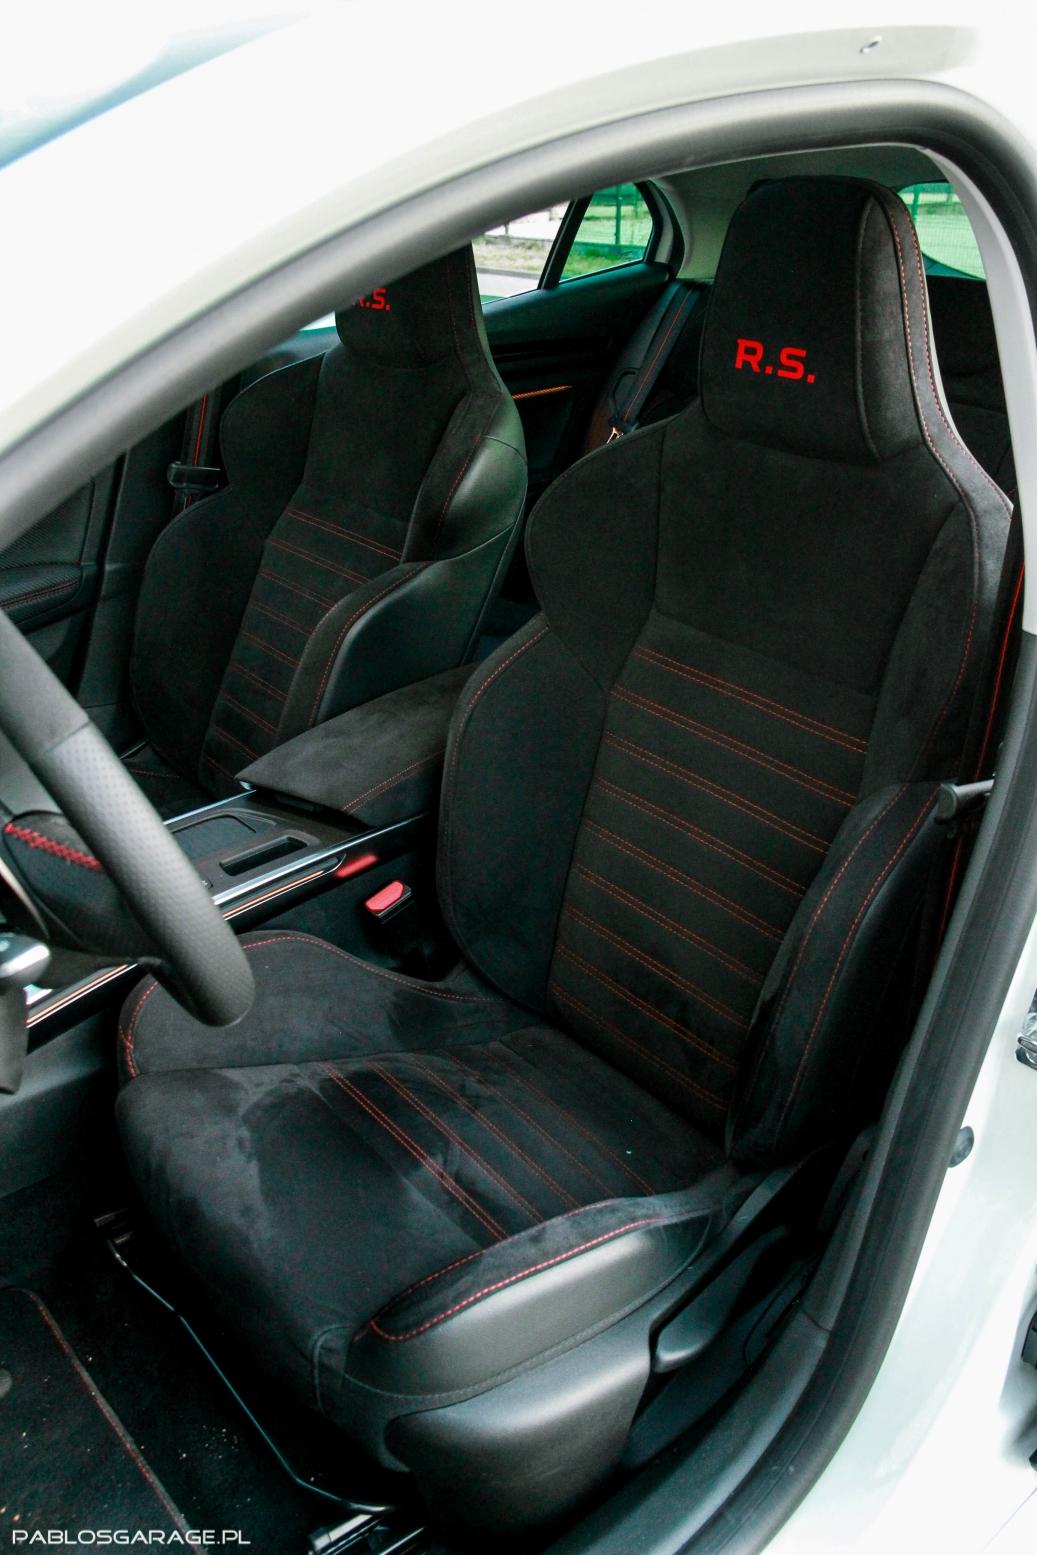 2018 Renault Megane RS 280 KM wnętrze, środek, interior